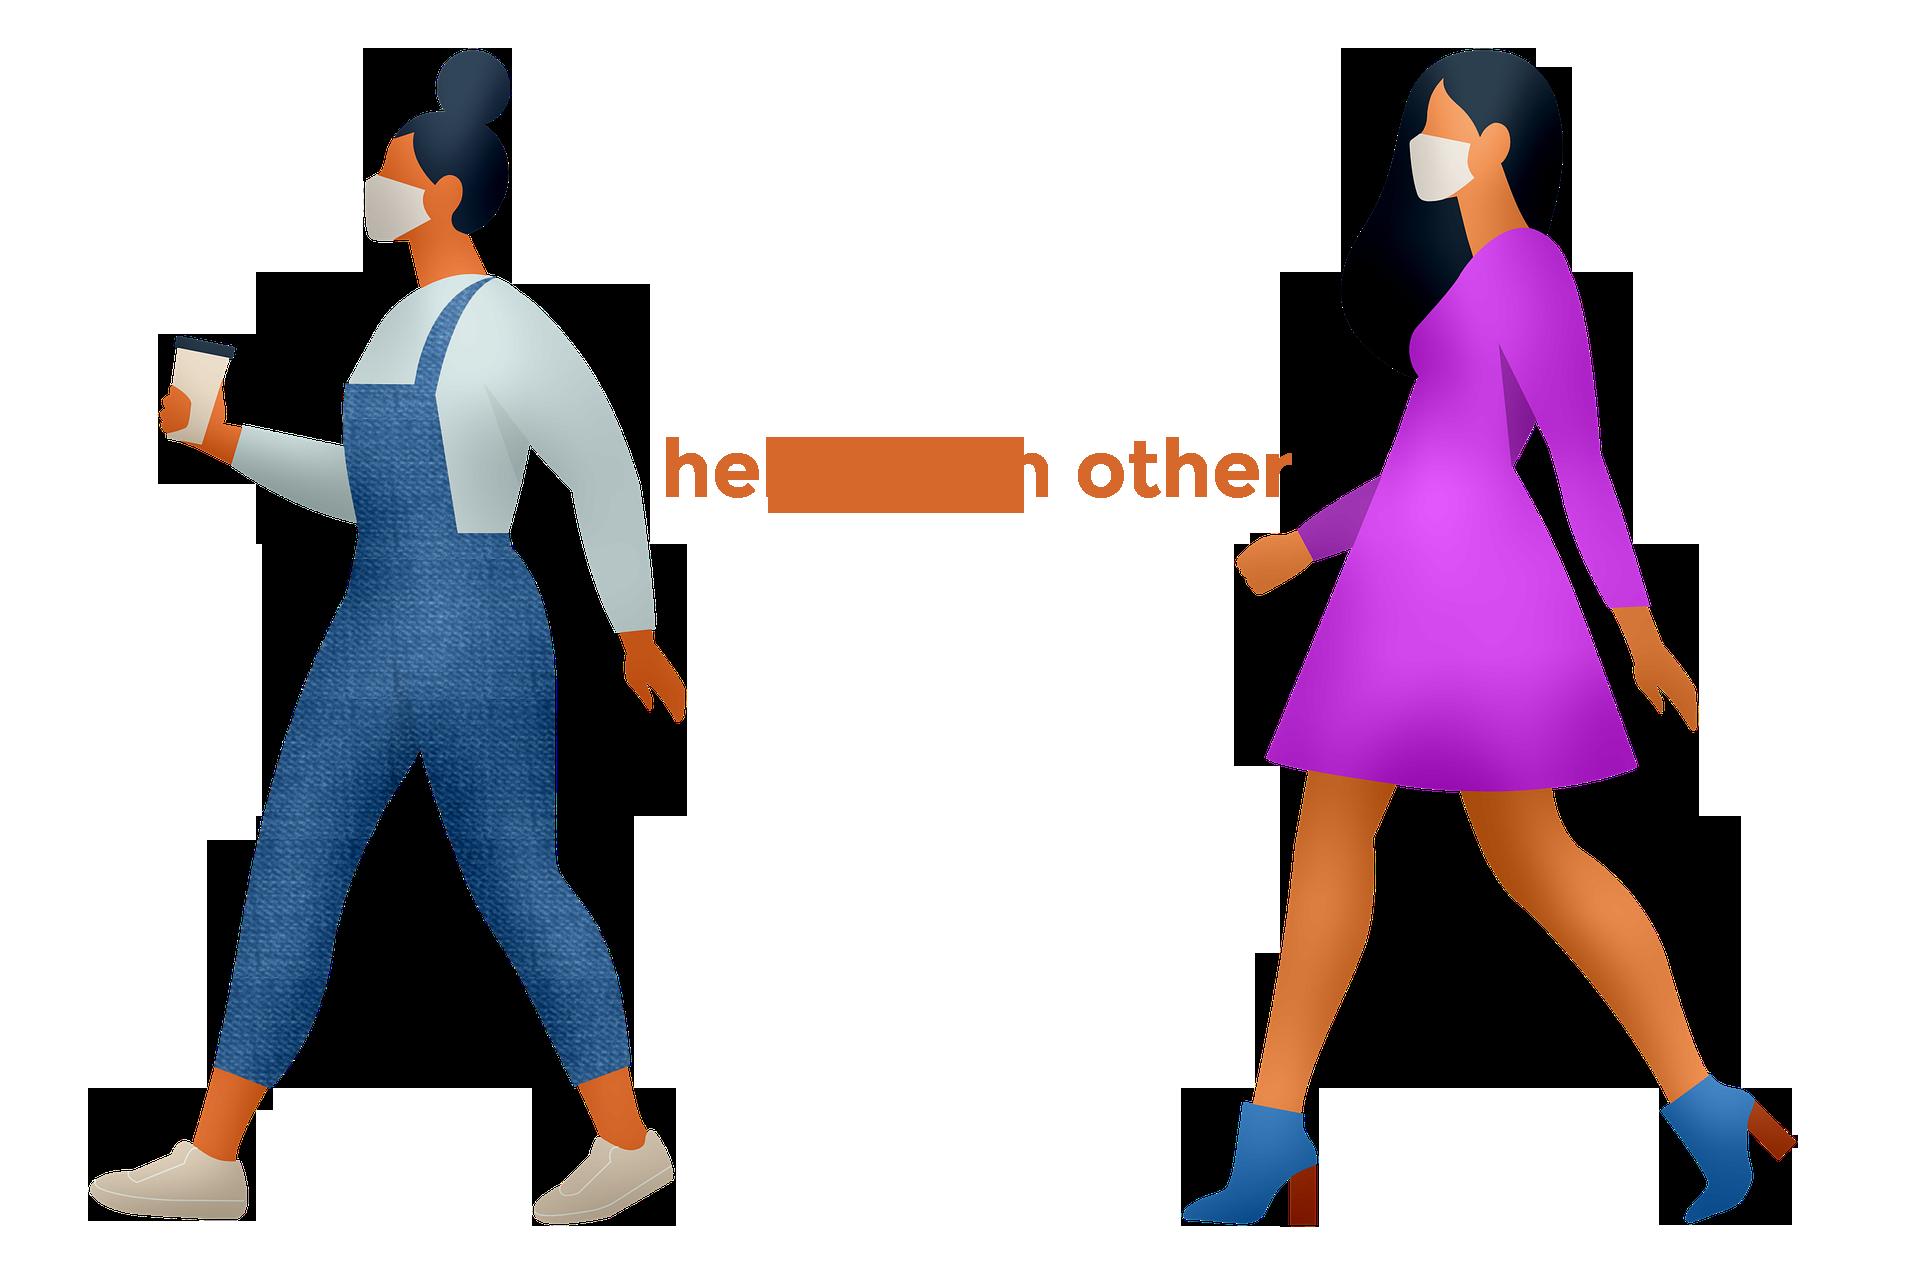 online.shop-vermieten help each other